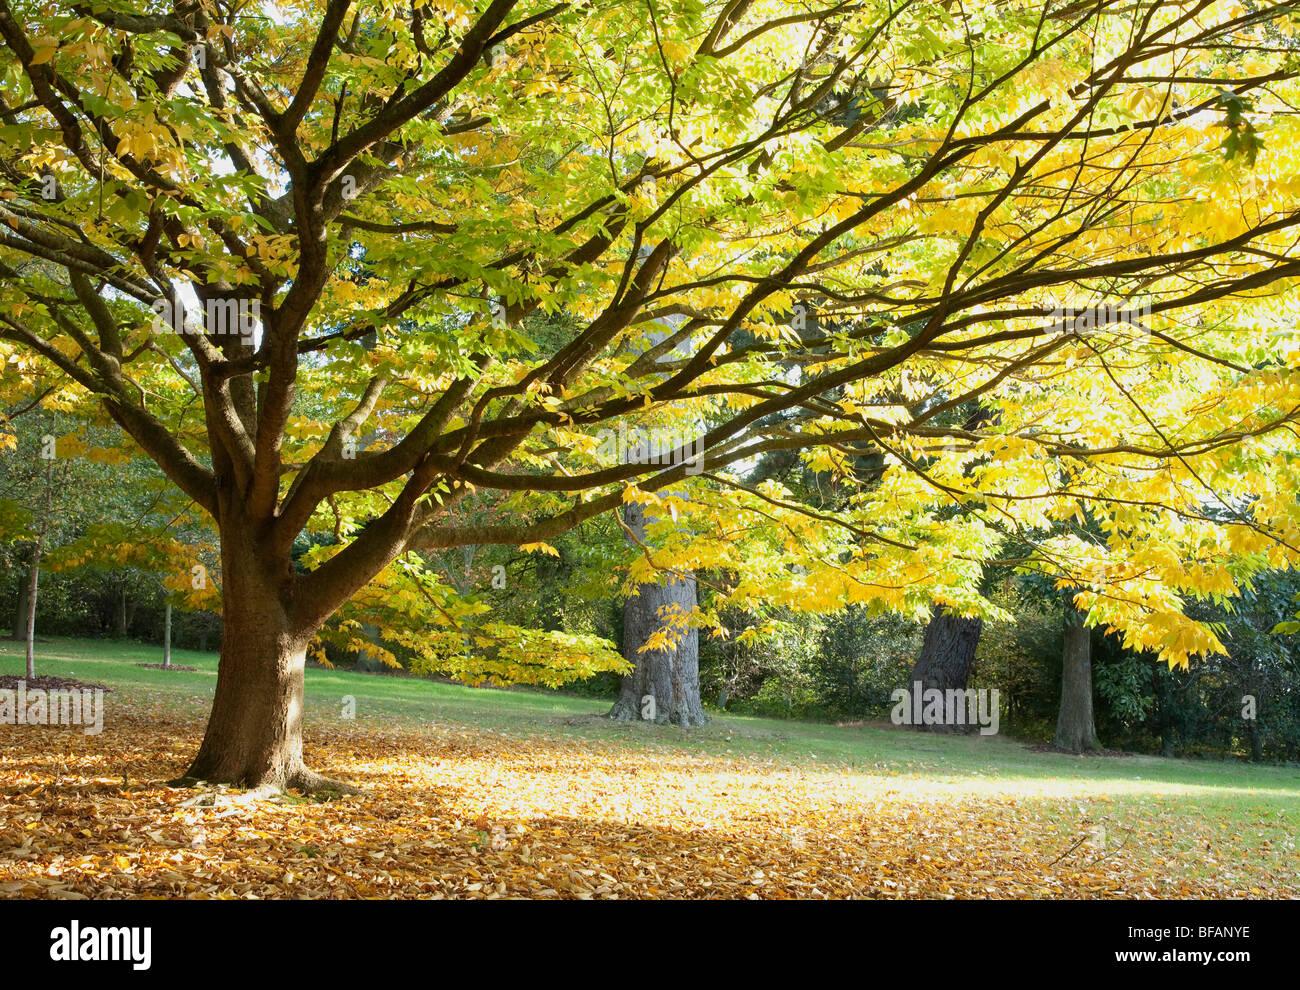 Japanese Zelkova Tree (Zelkova Serrata) - Stock Image